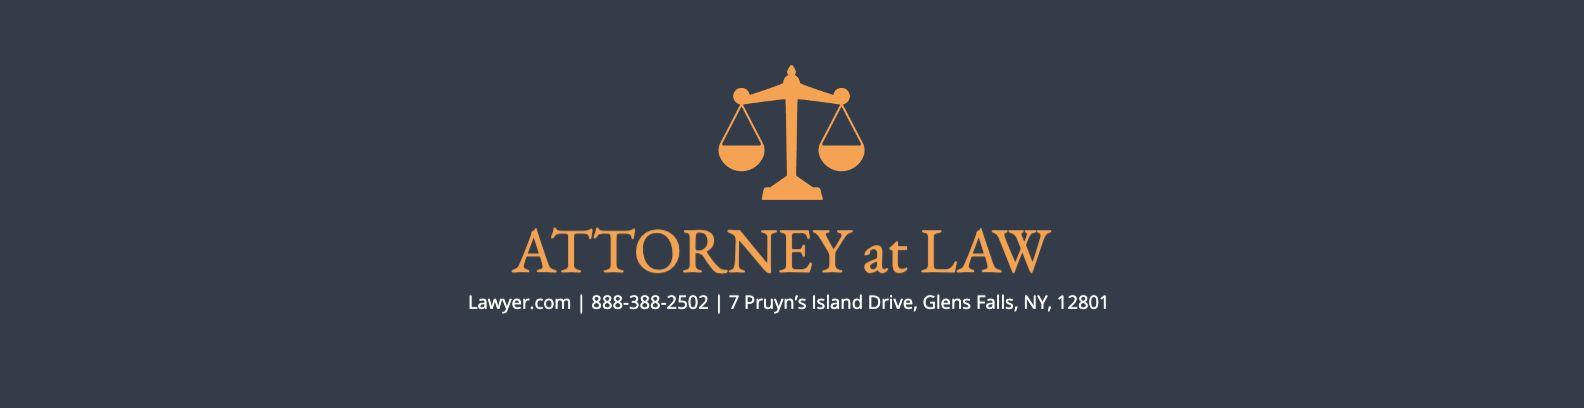 Classic Attorney